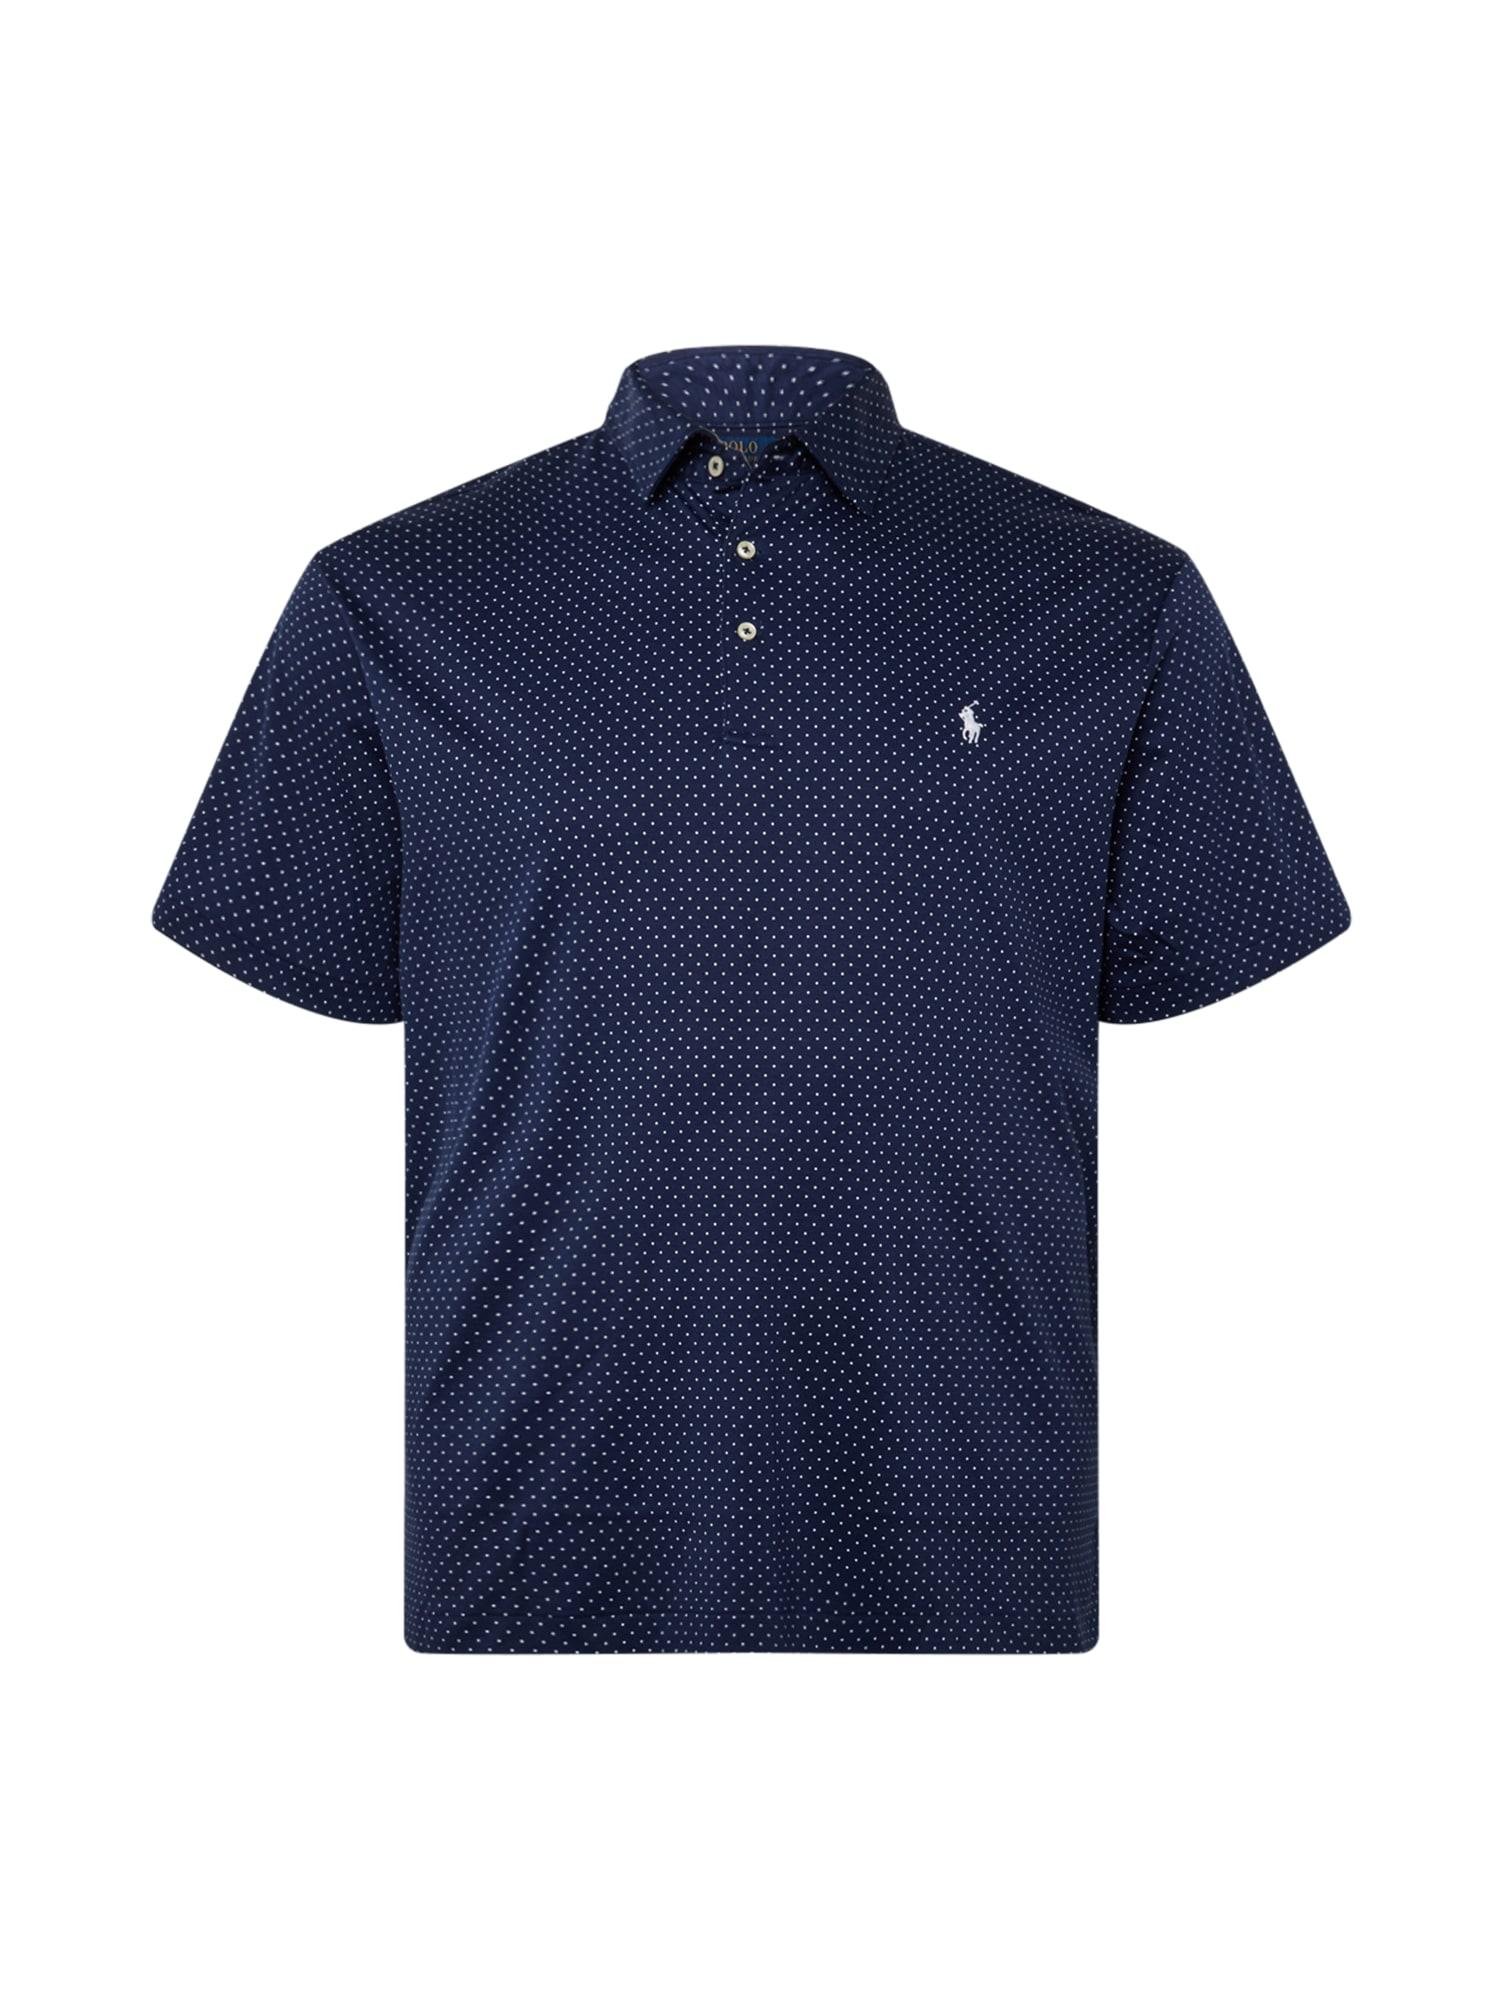 Polo Ralph Lauren Big & Tall Marškinėliai tamsiai mėlyna / balta